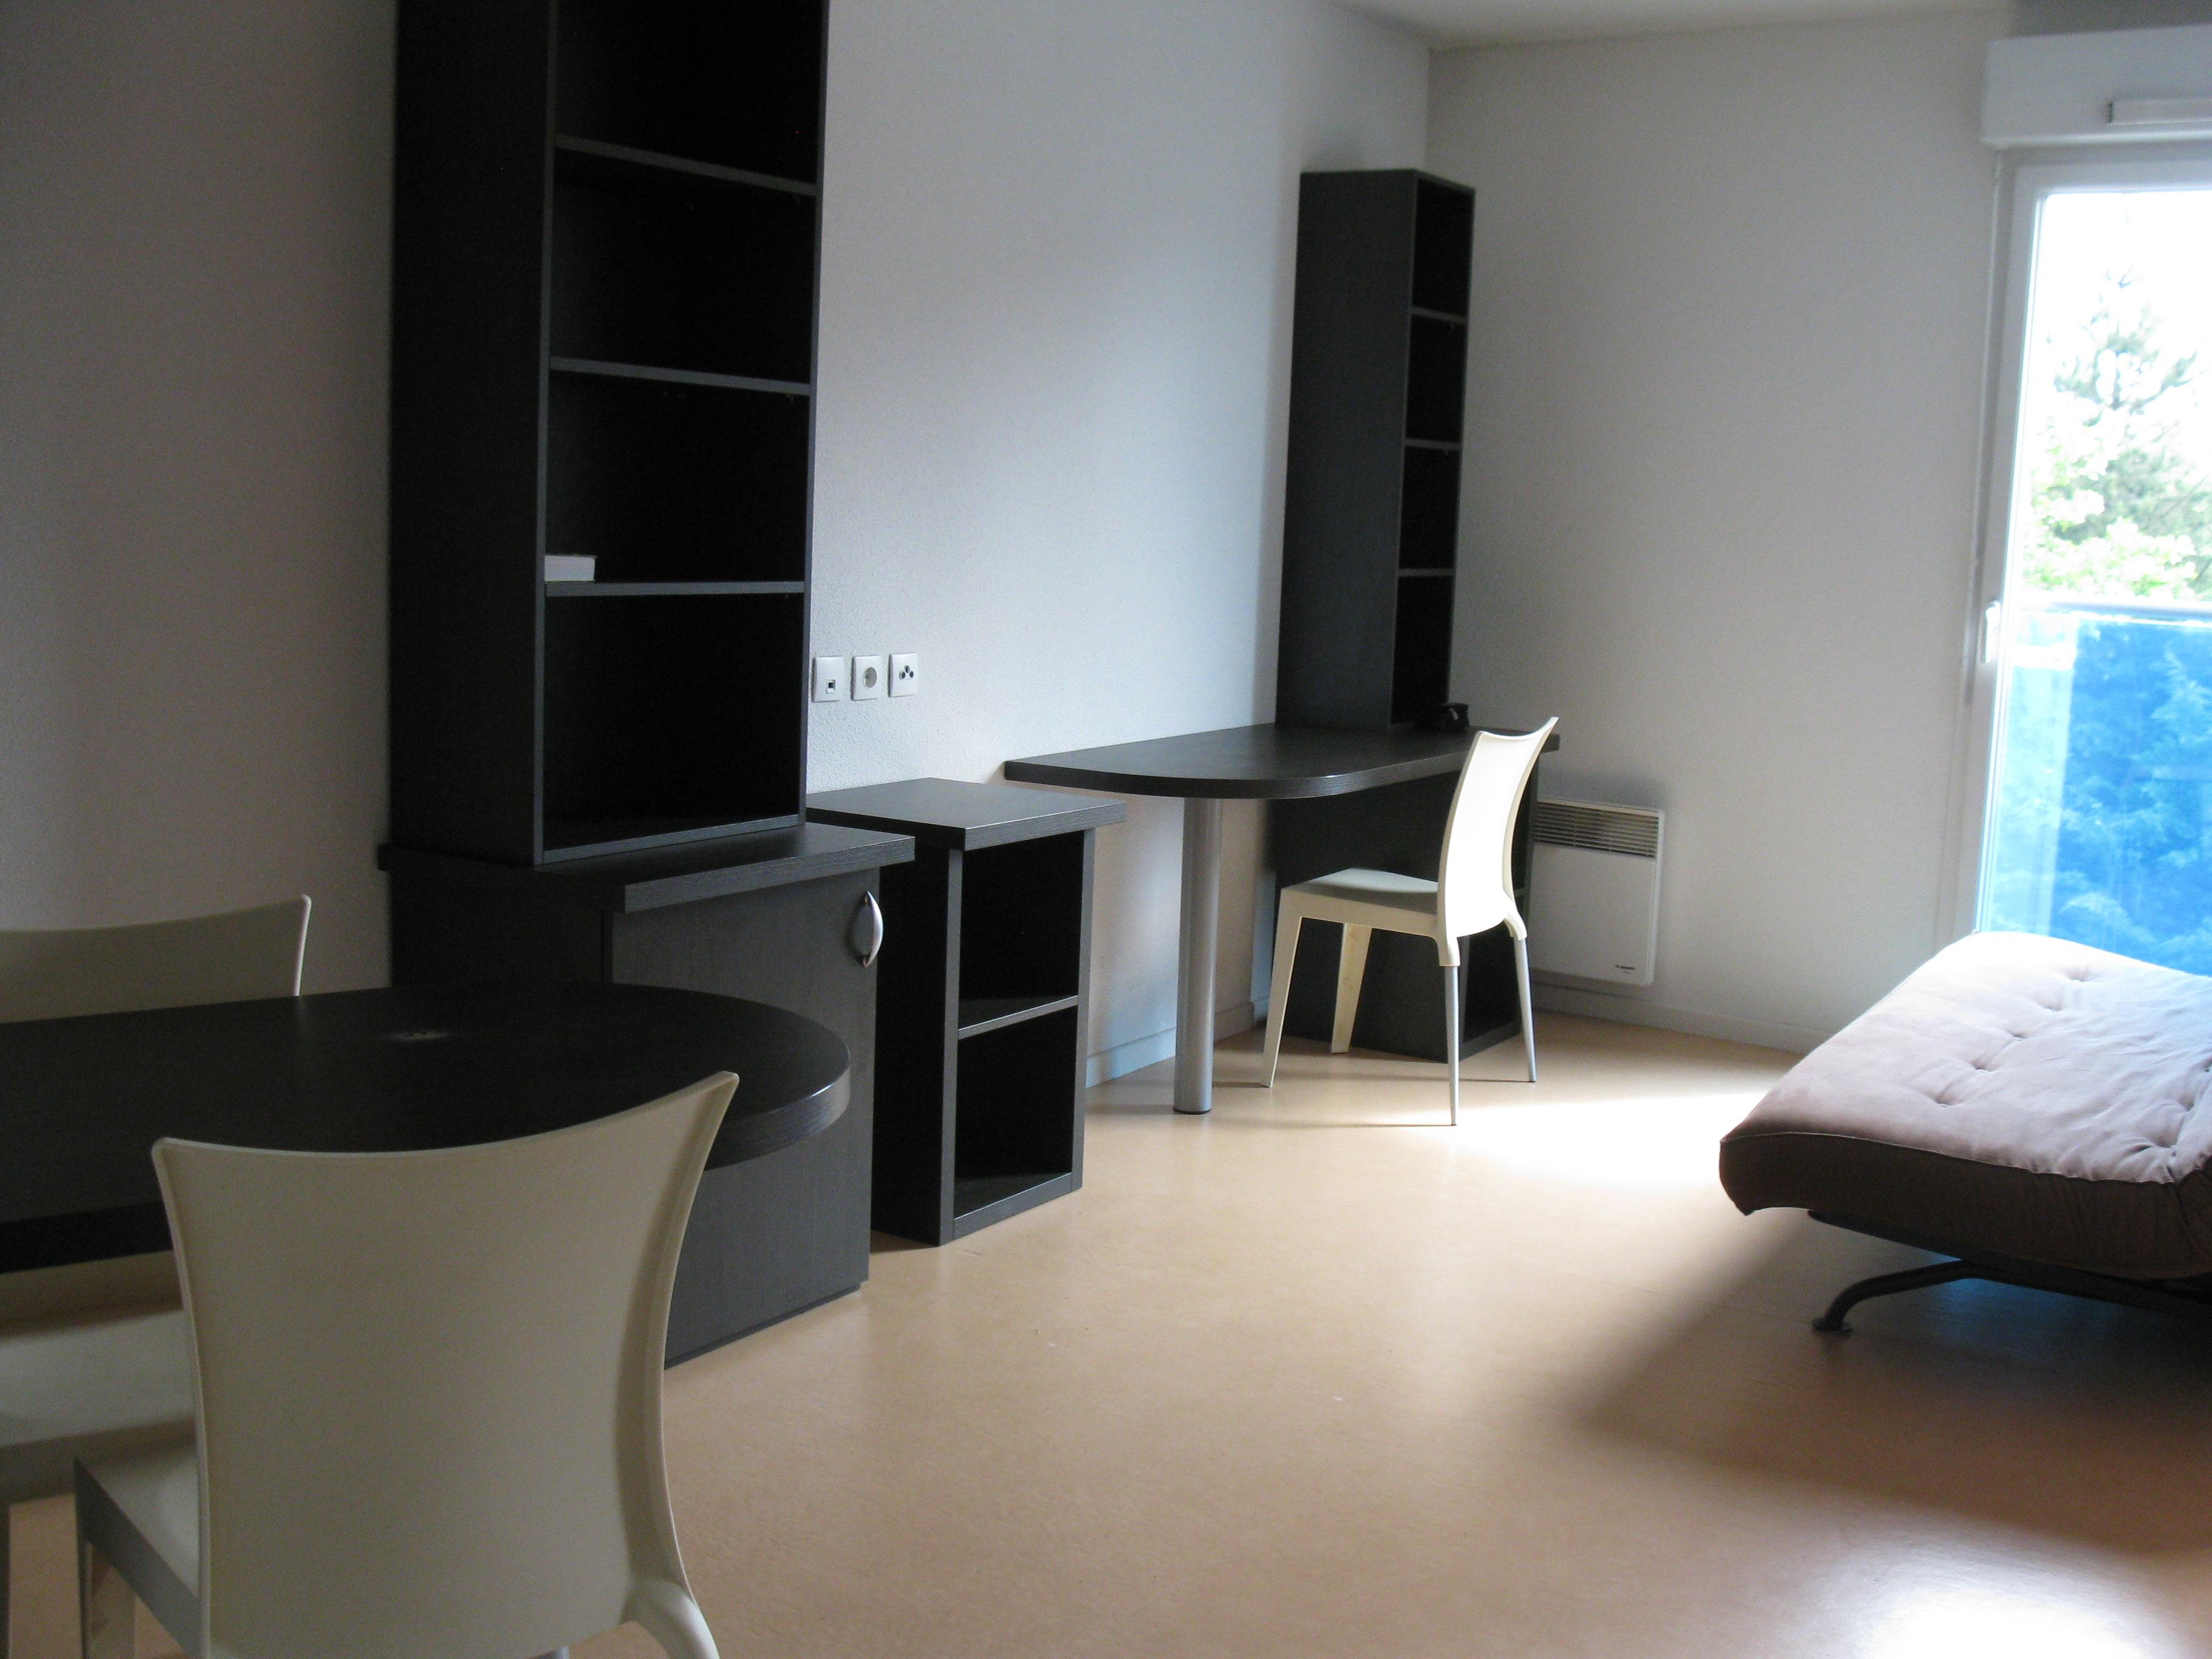 location tudiant loue meuble nantes. Black Bedroom Furniture Sets. Home Design Ideas